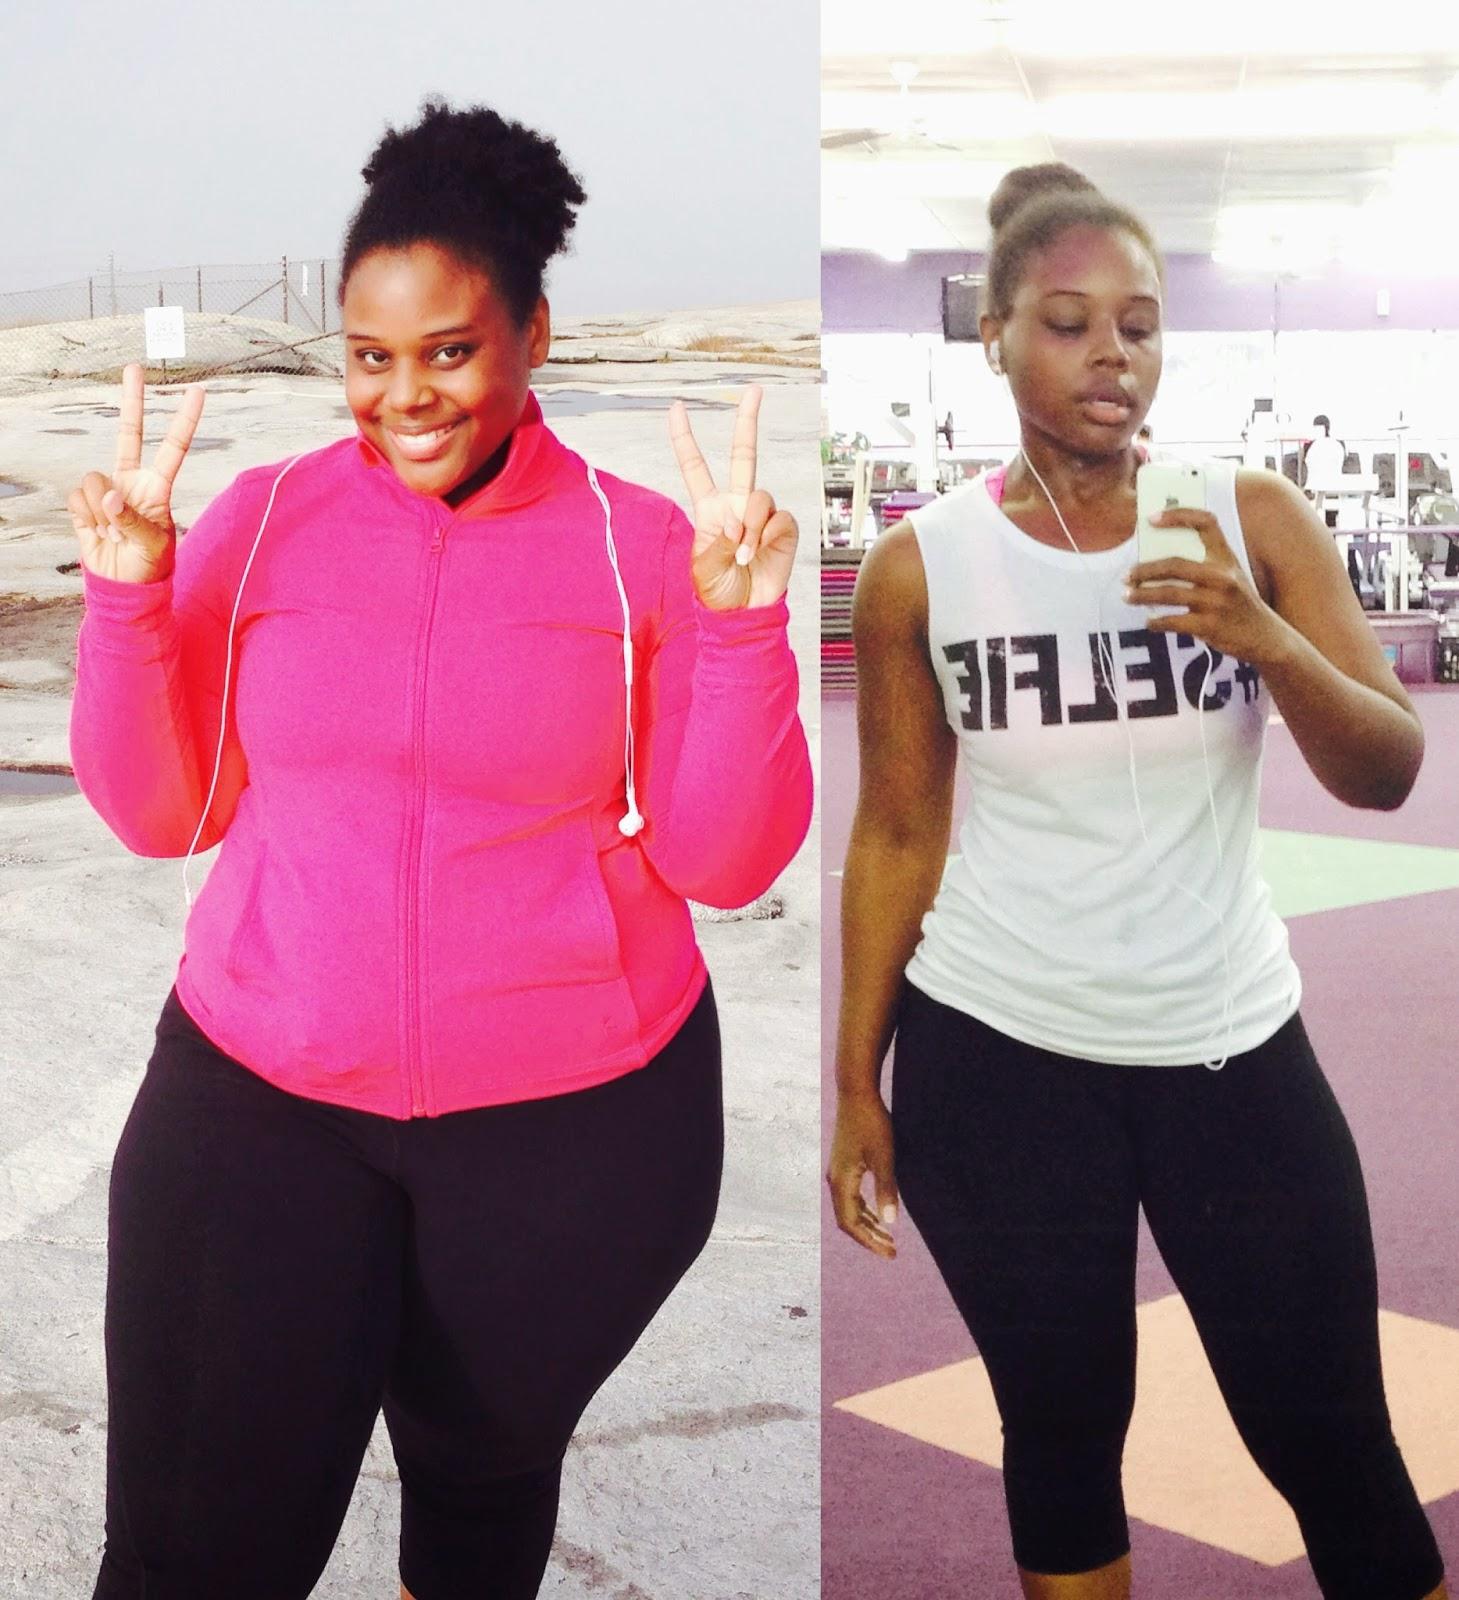 Three week weight loss program